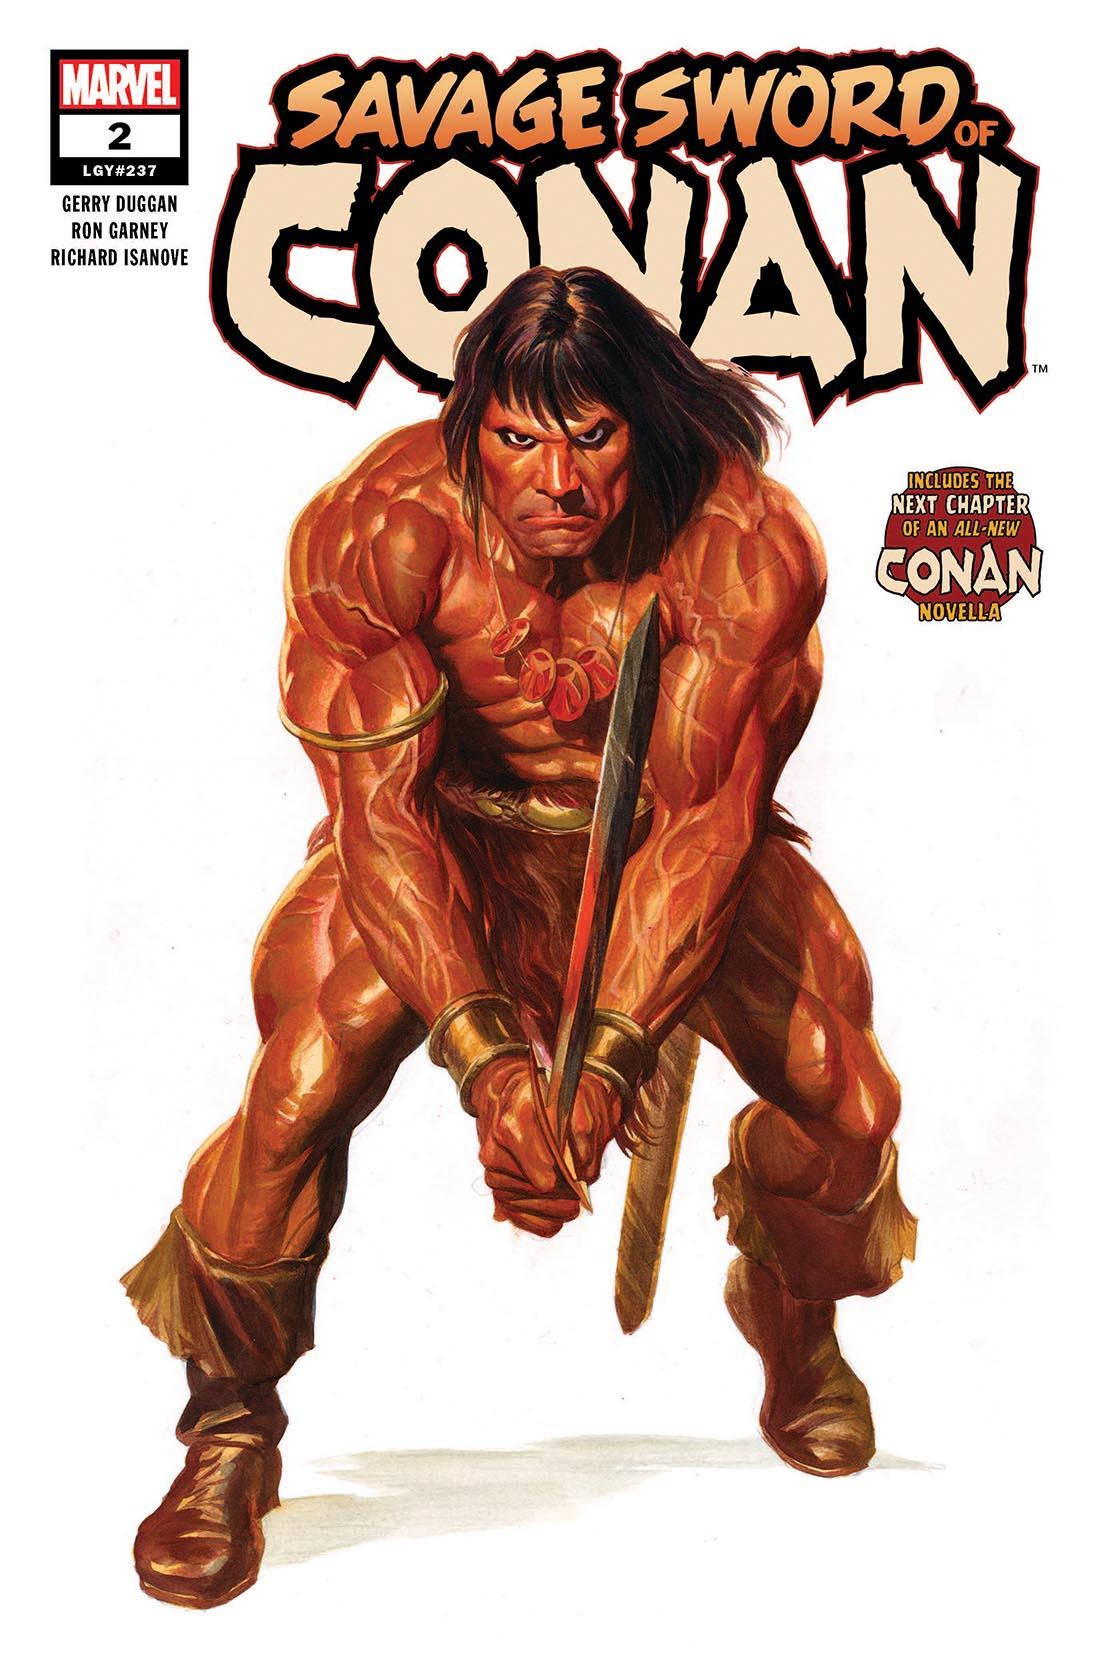 Savage Sword of Conan (2019) #2